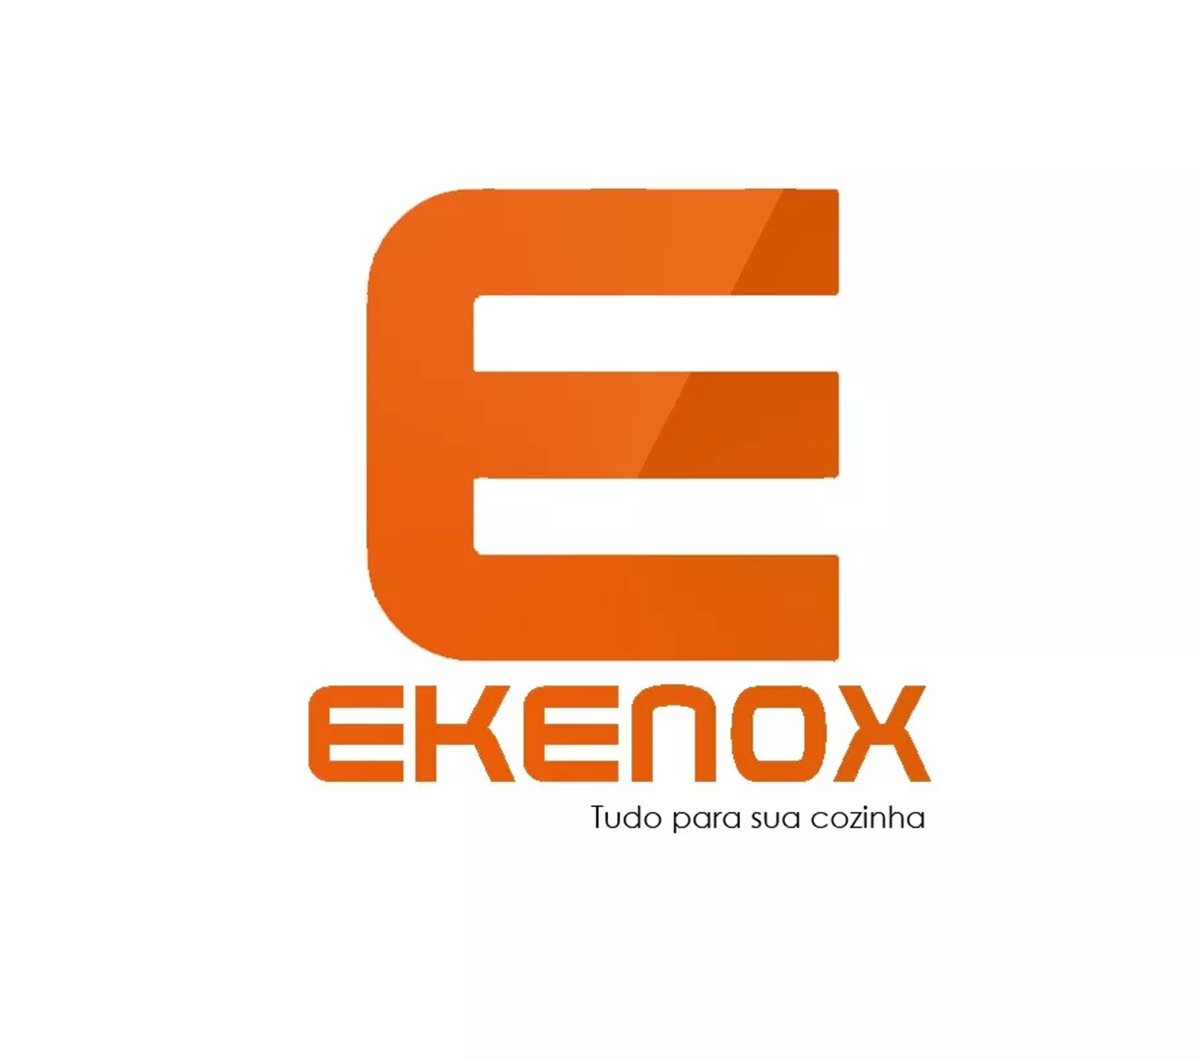 PORTA CEDULAS NIQUELEIRA EKENOX  - EKENOX- Equipamentos Industriais